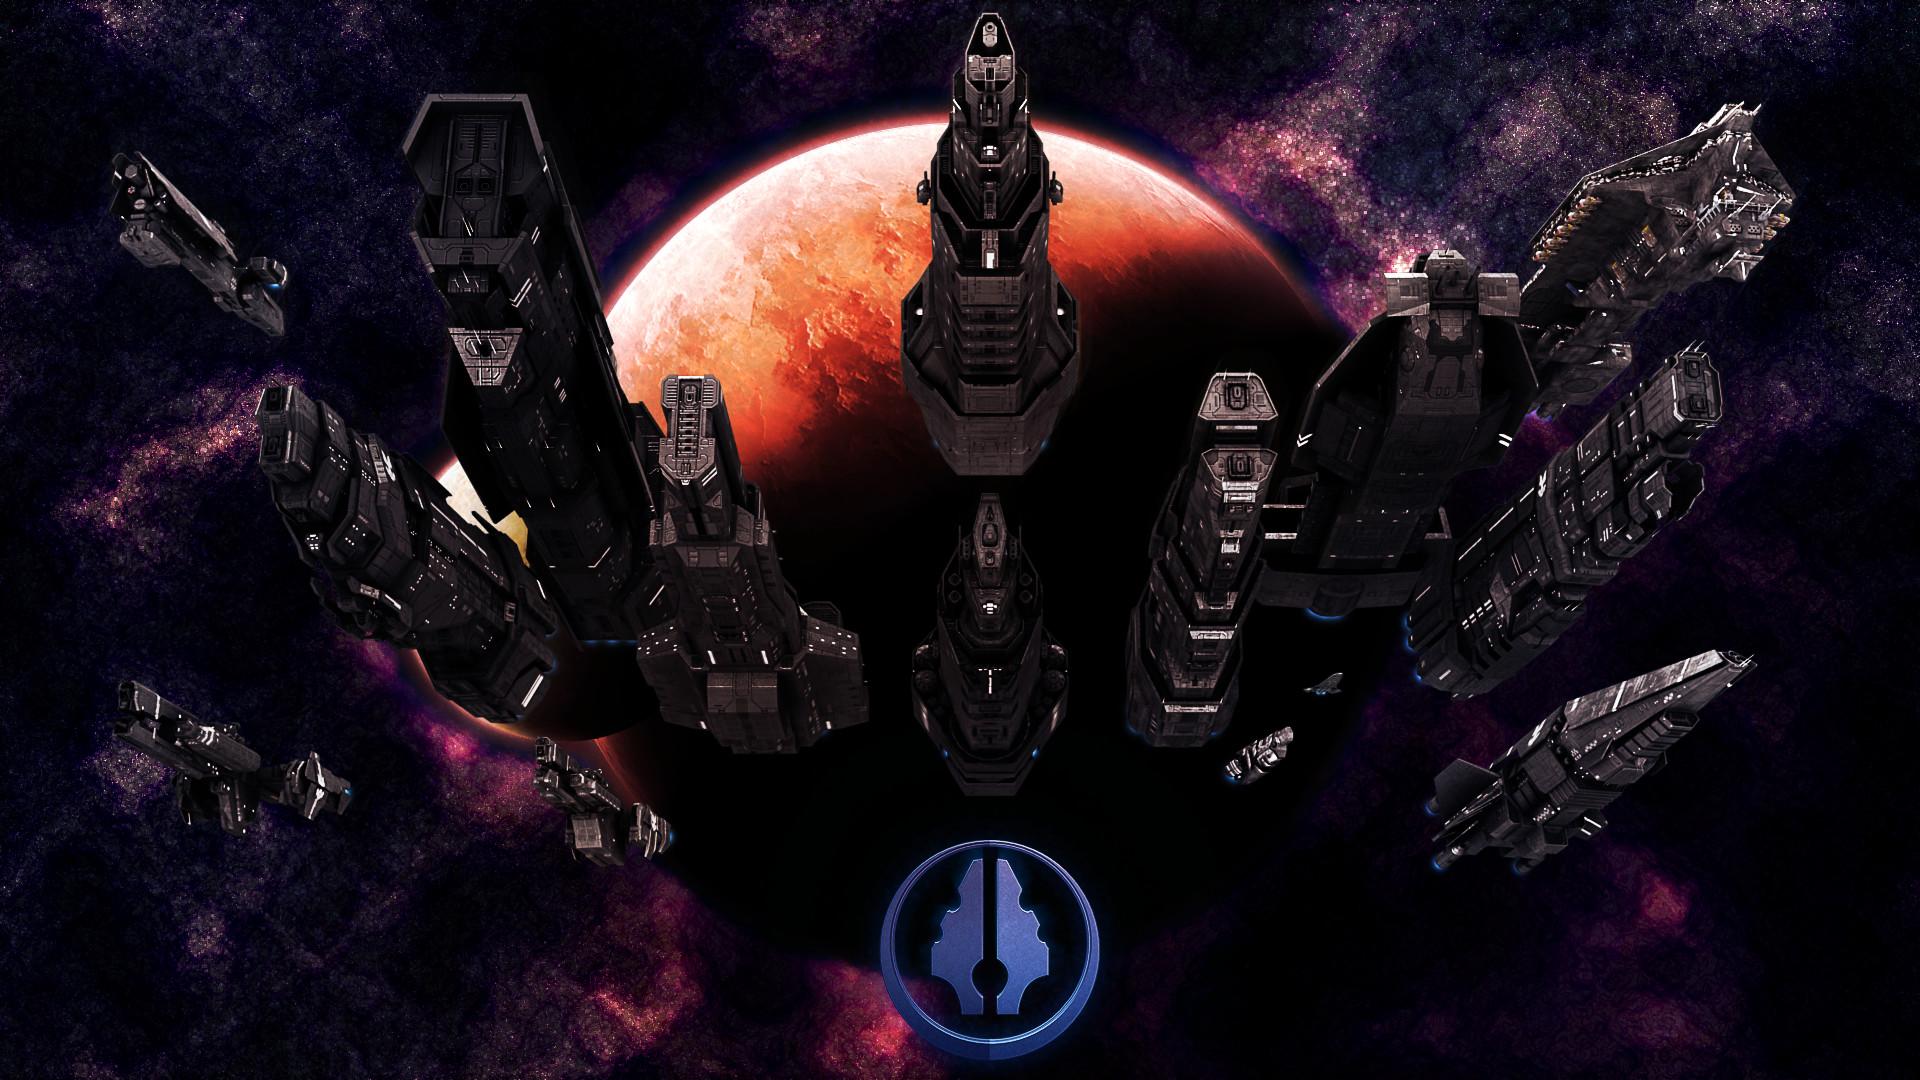 Res: 1920x1080, UNSC Fleet by Annihilater102 UNSC Fleet by Annihilater102